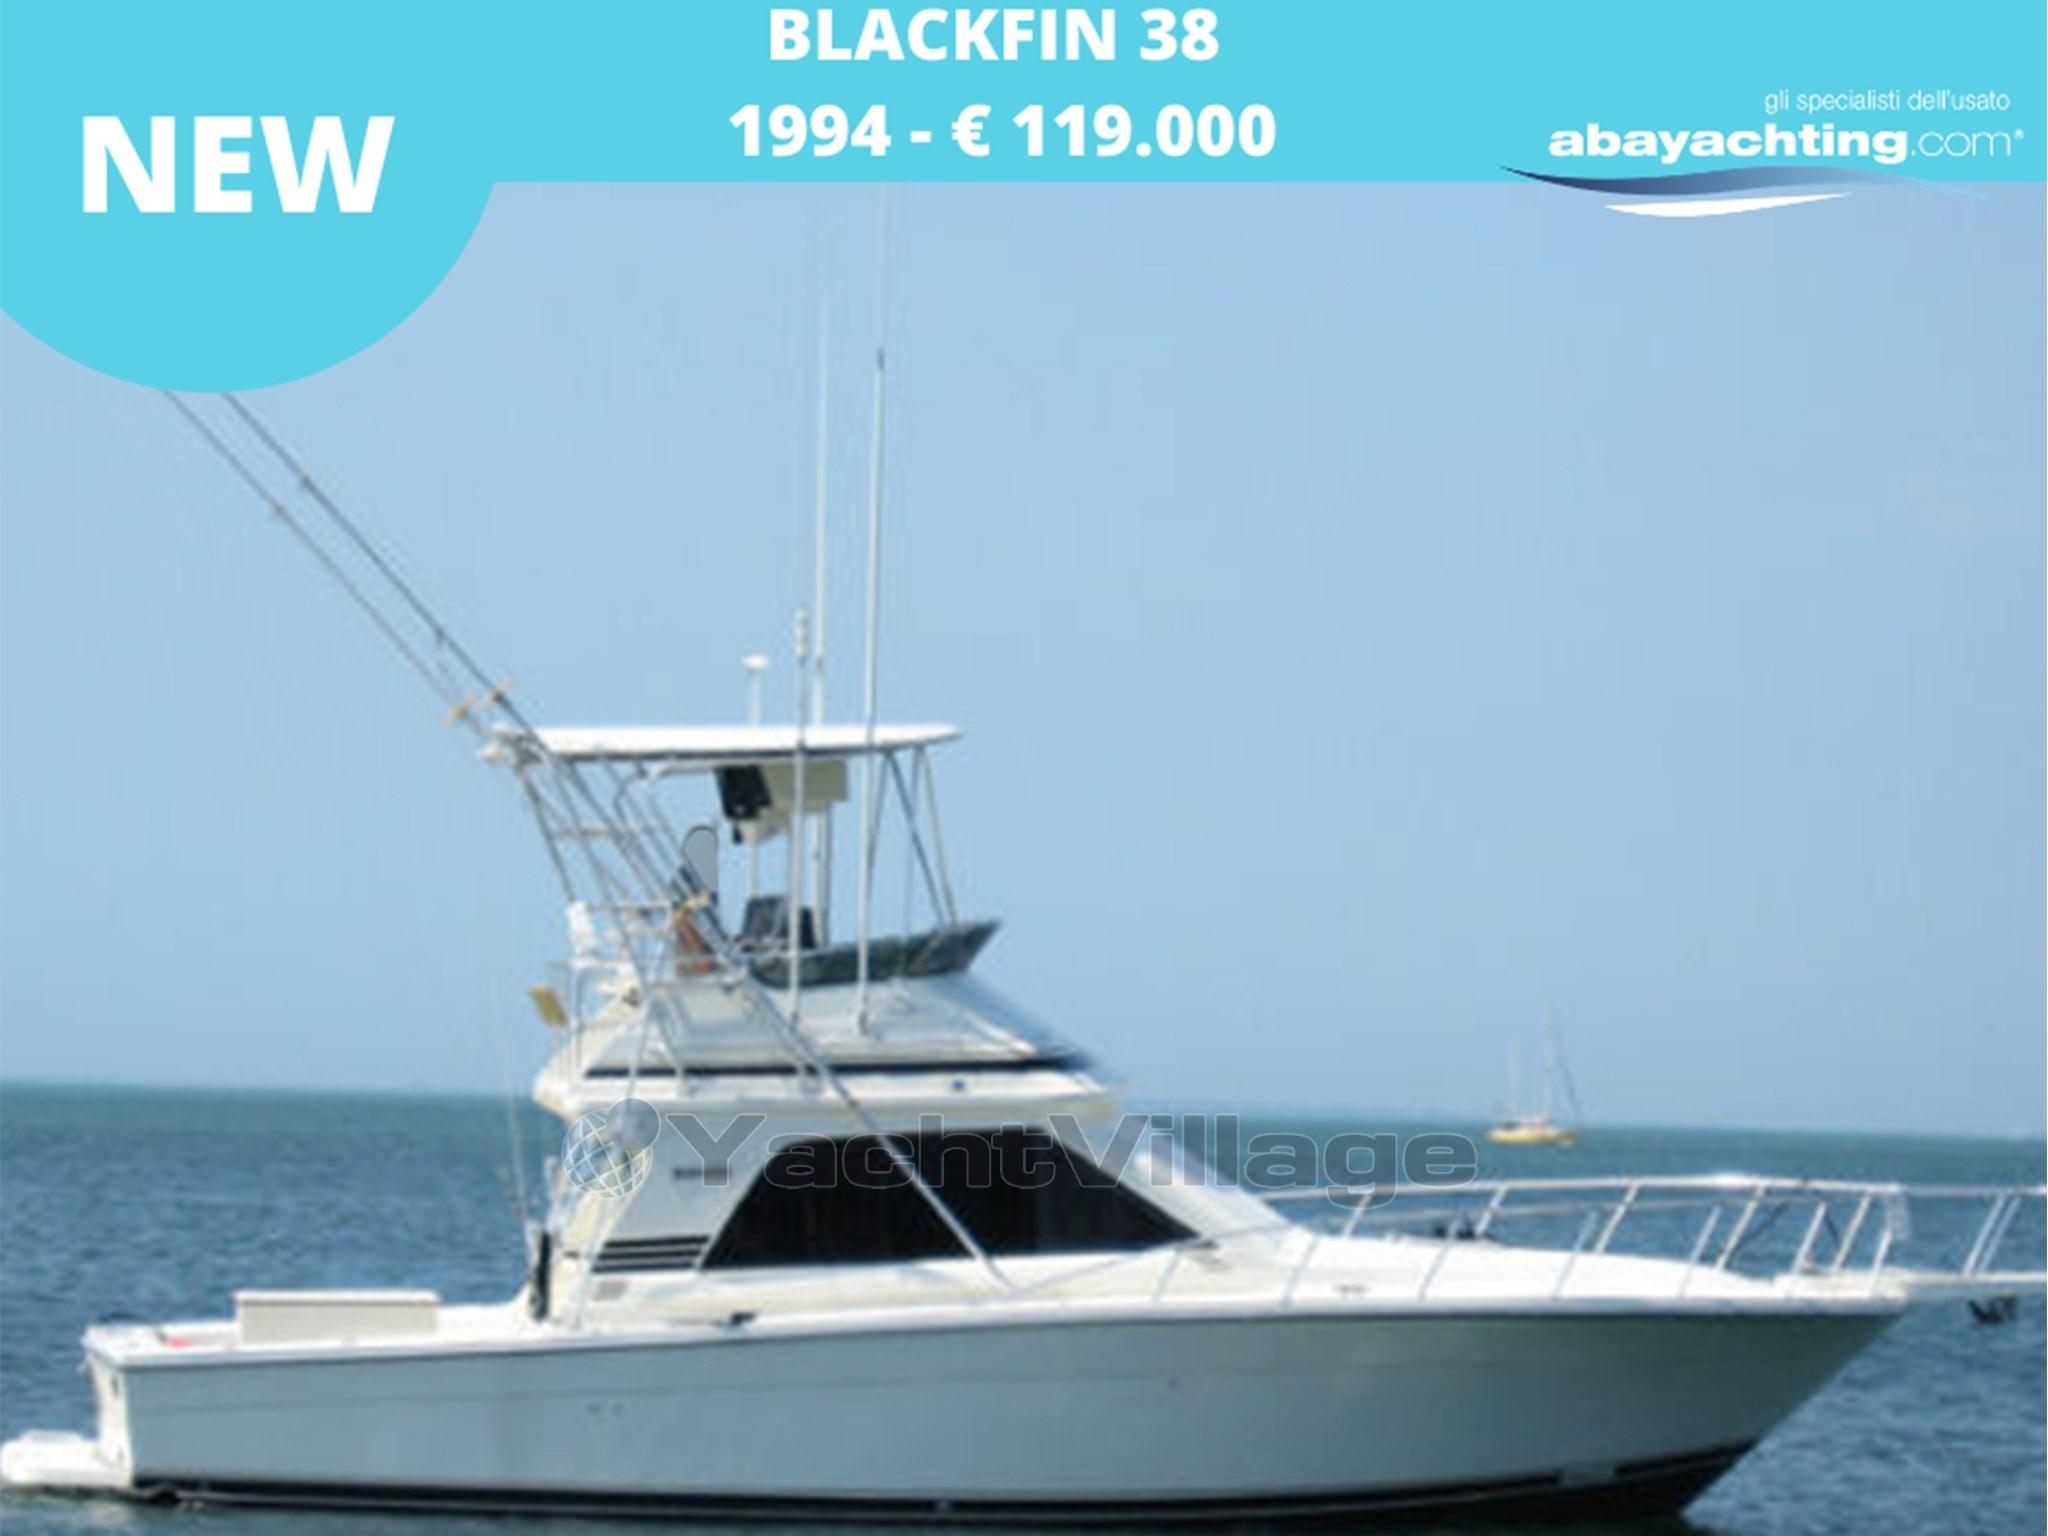 Abayachting Nuovo arrivo Blackfin 38